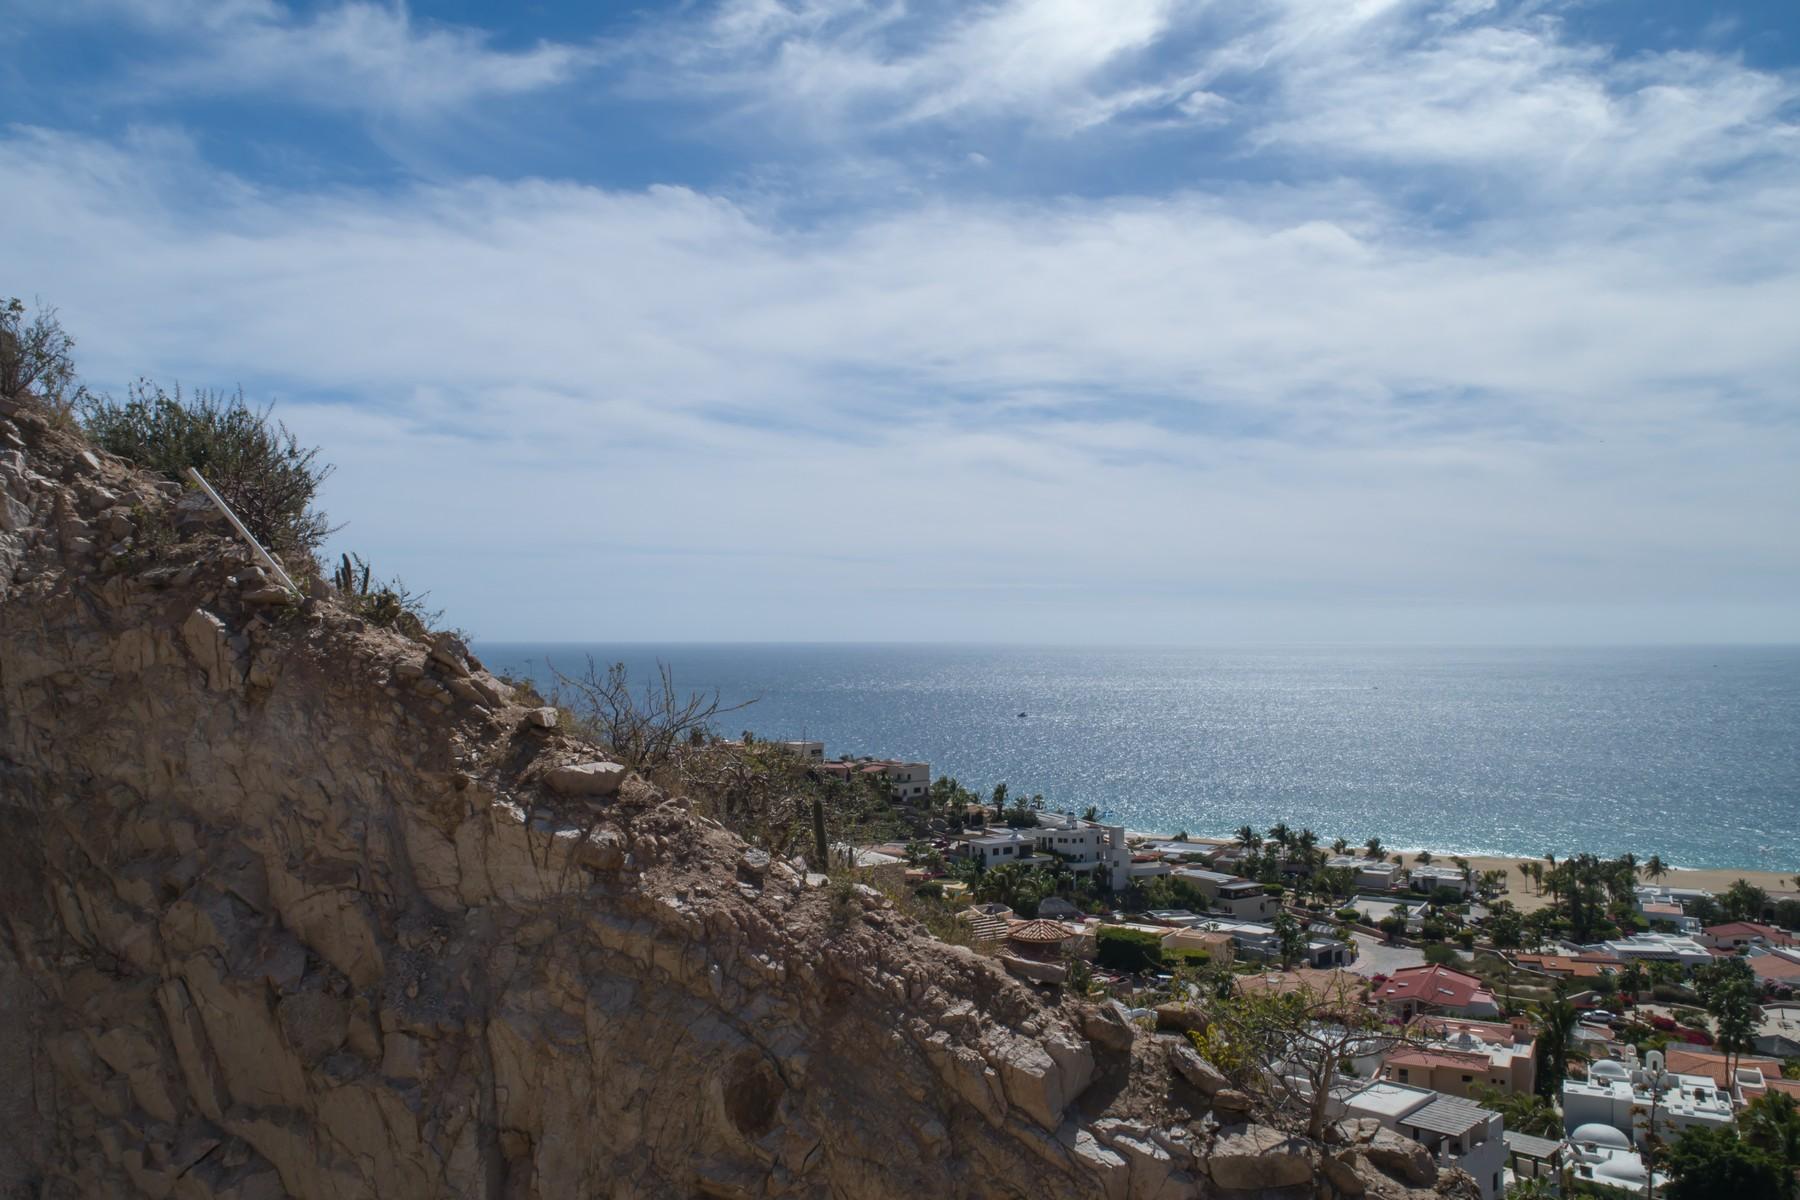 Additional photo for property listing at Lote Pedregal Camino del Sol 25 Lote #25 Manzana 36, Calle Camino del Sol Pedregal de Cabo San Lucas Cabo San Lucas, Baja California Sur 23453 Mexico